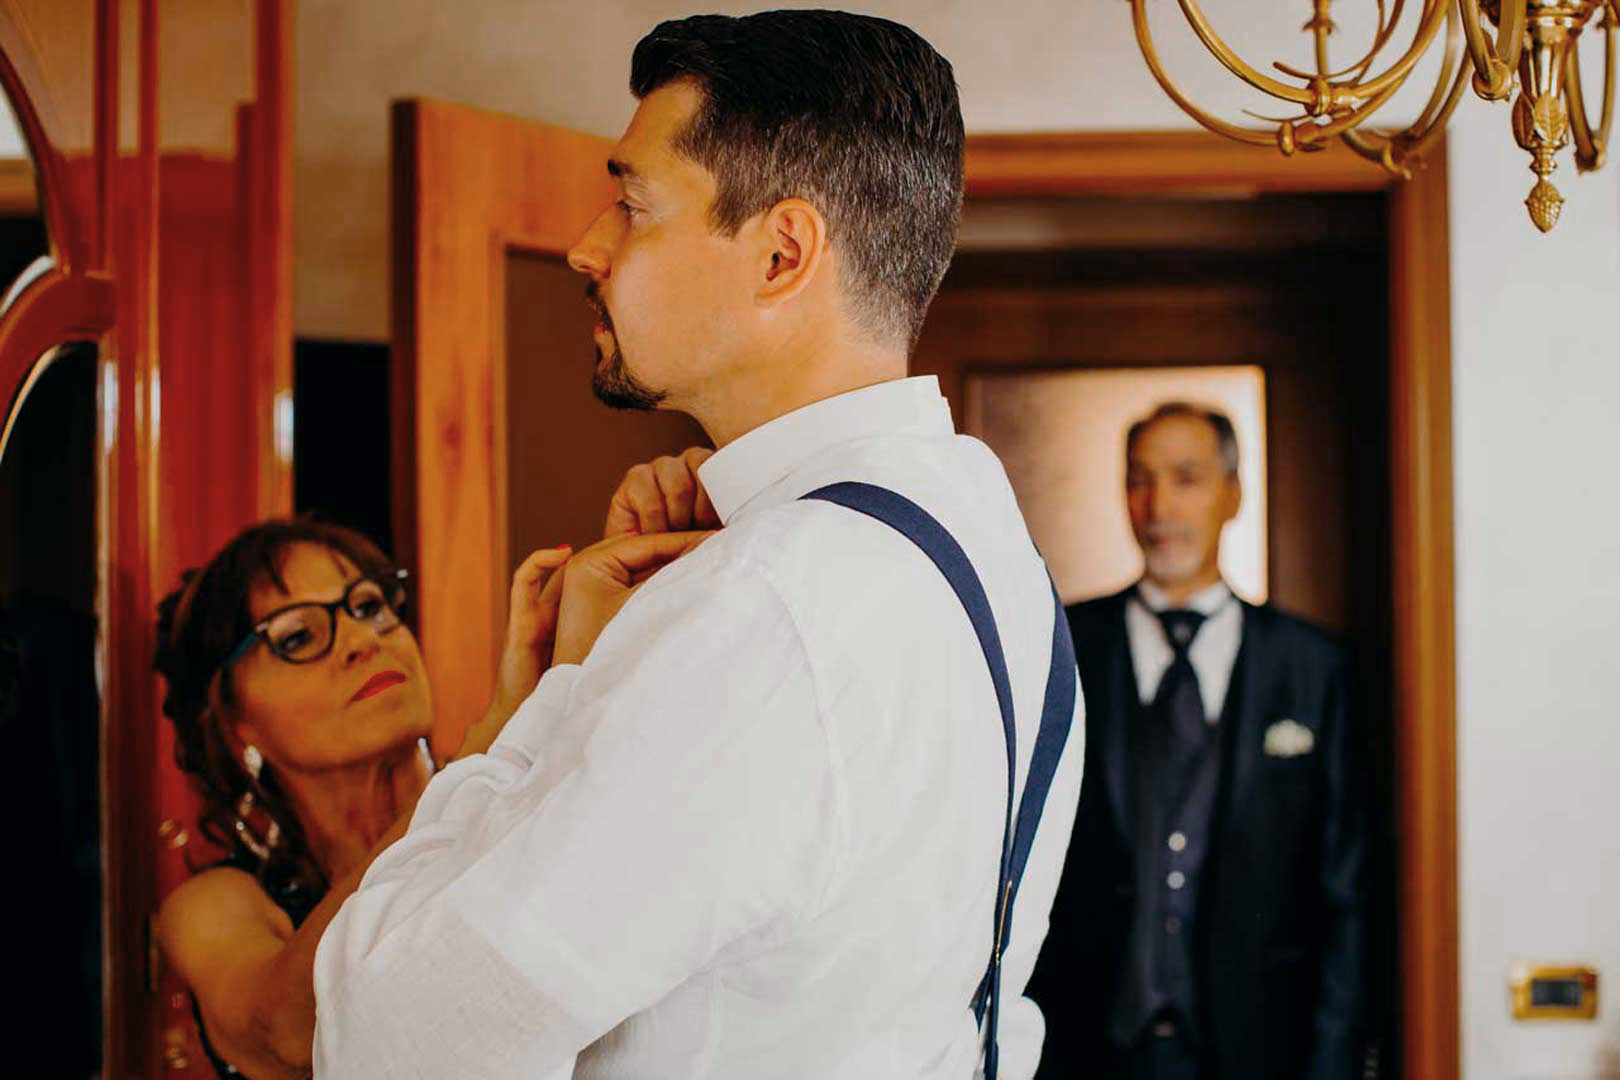 003-preparativi-sposo-matrimonio-gianni-lepore